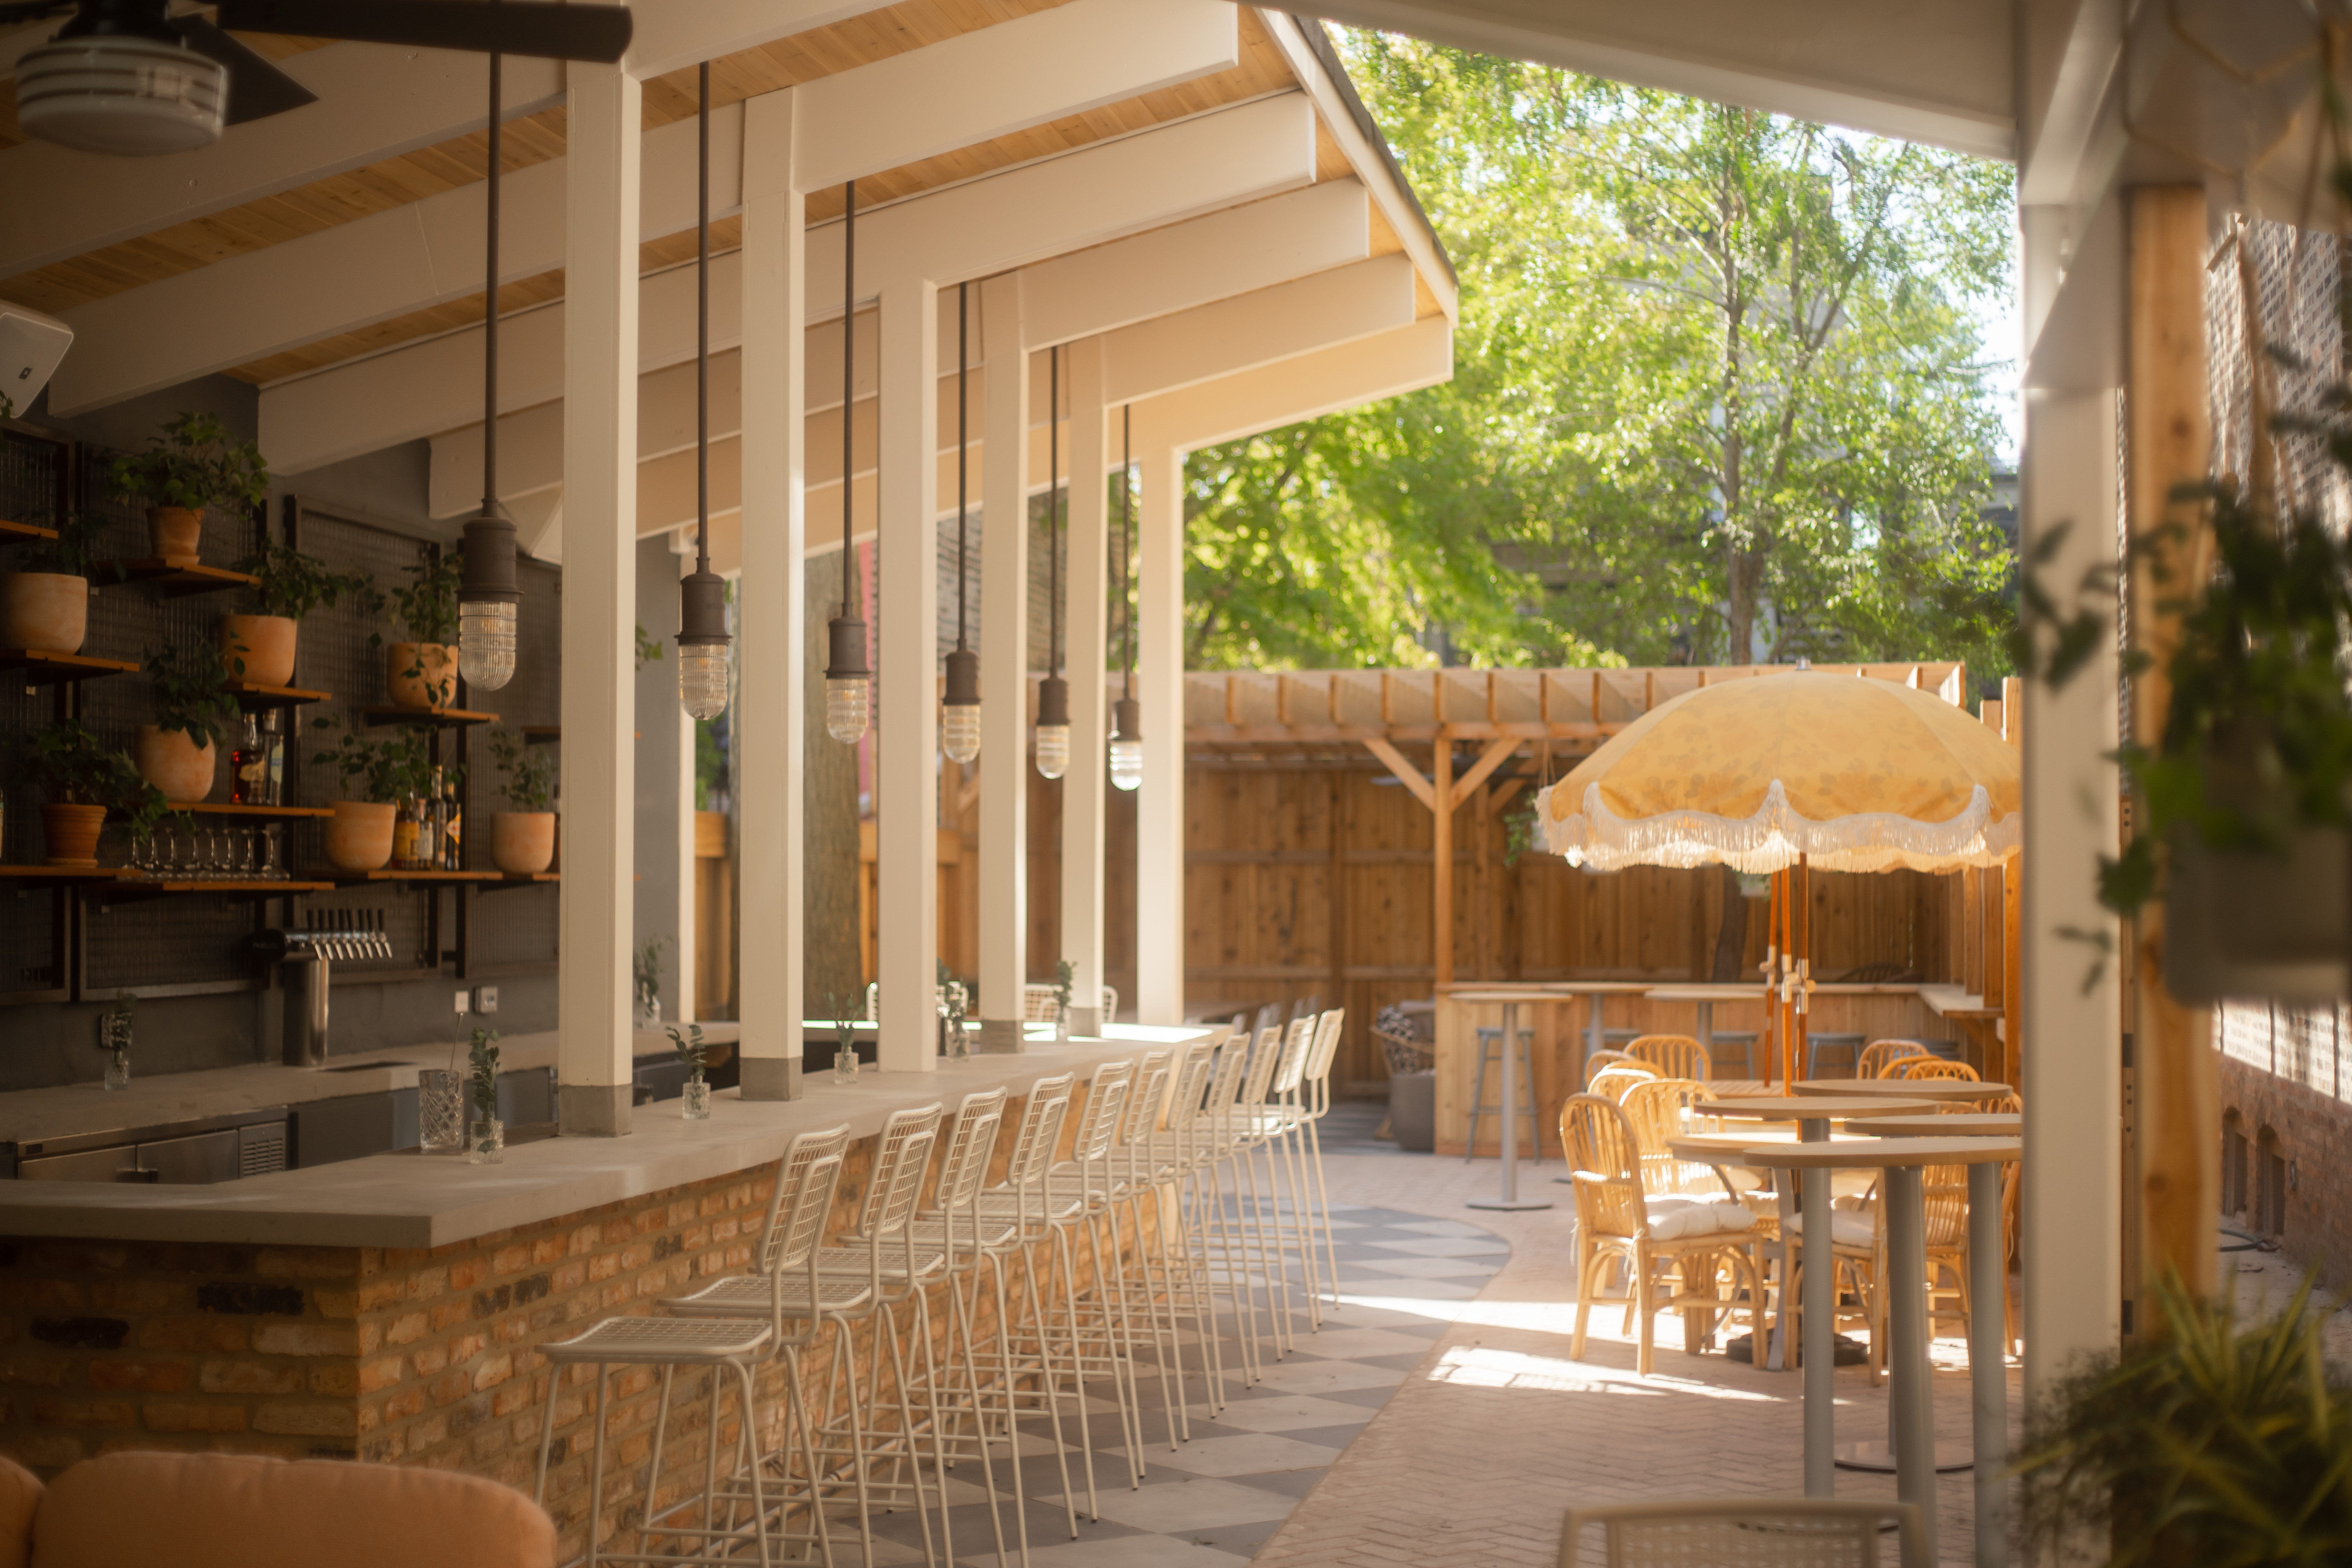 A patio bar.